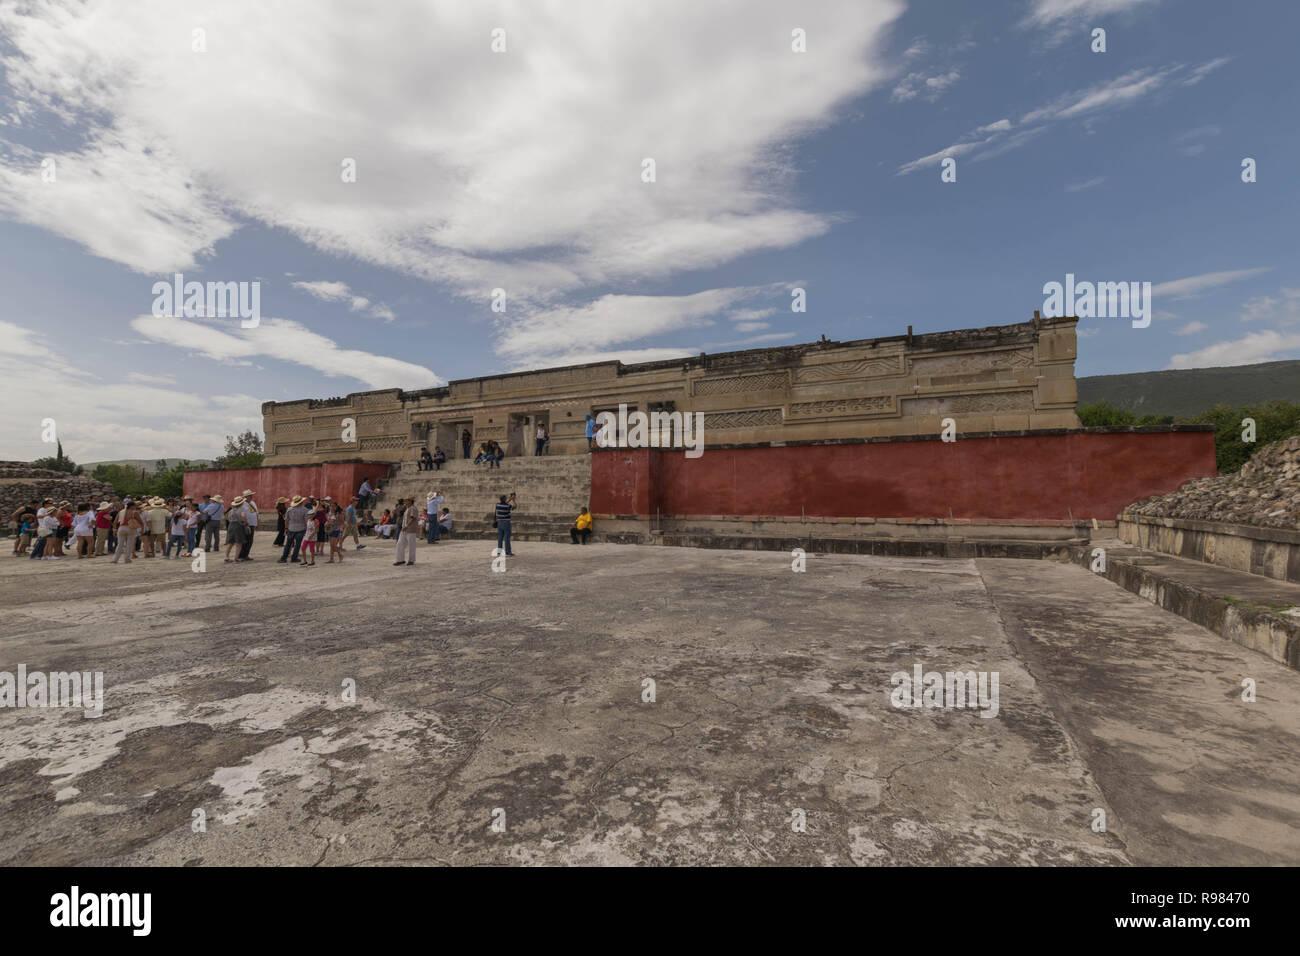 Nombreuses debout devant l'une des principales ruines de Mitla, dans l'Oaxaca, Mexique Photo Stock